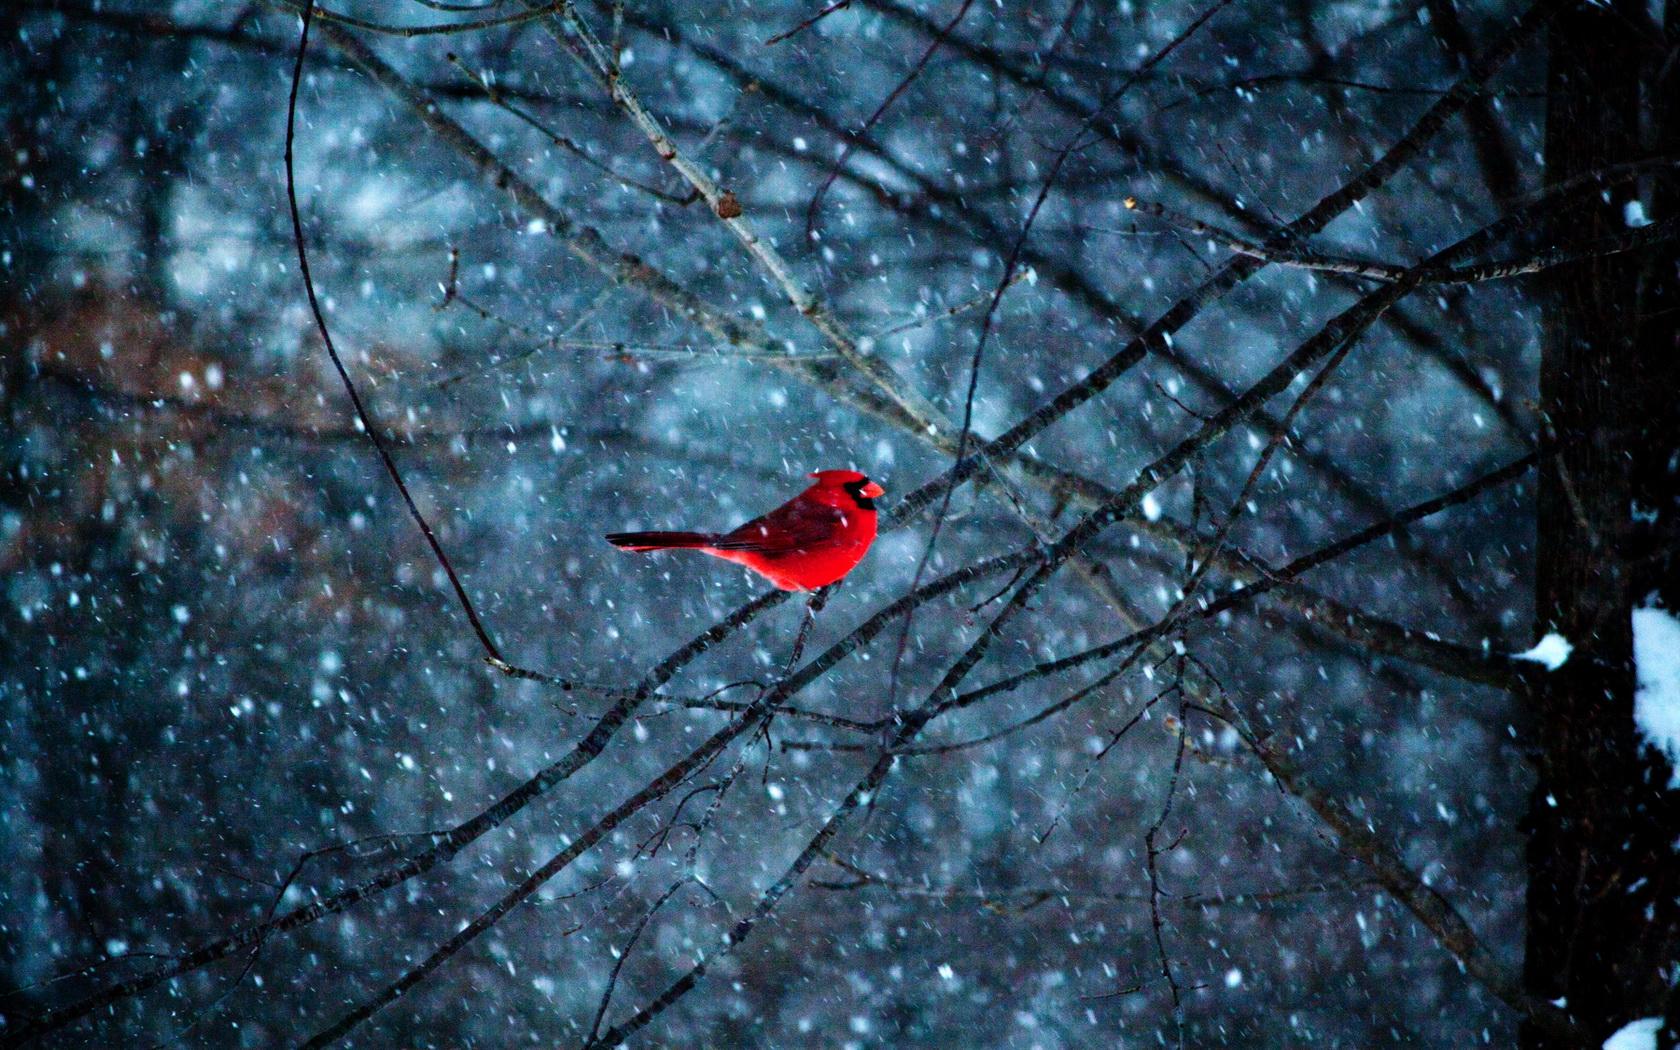 Red Bird in Snowflakes wallpaper by LadyGaga RevelWallpapersnet 1680x1050